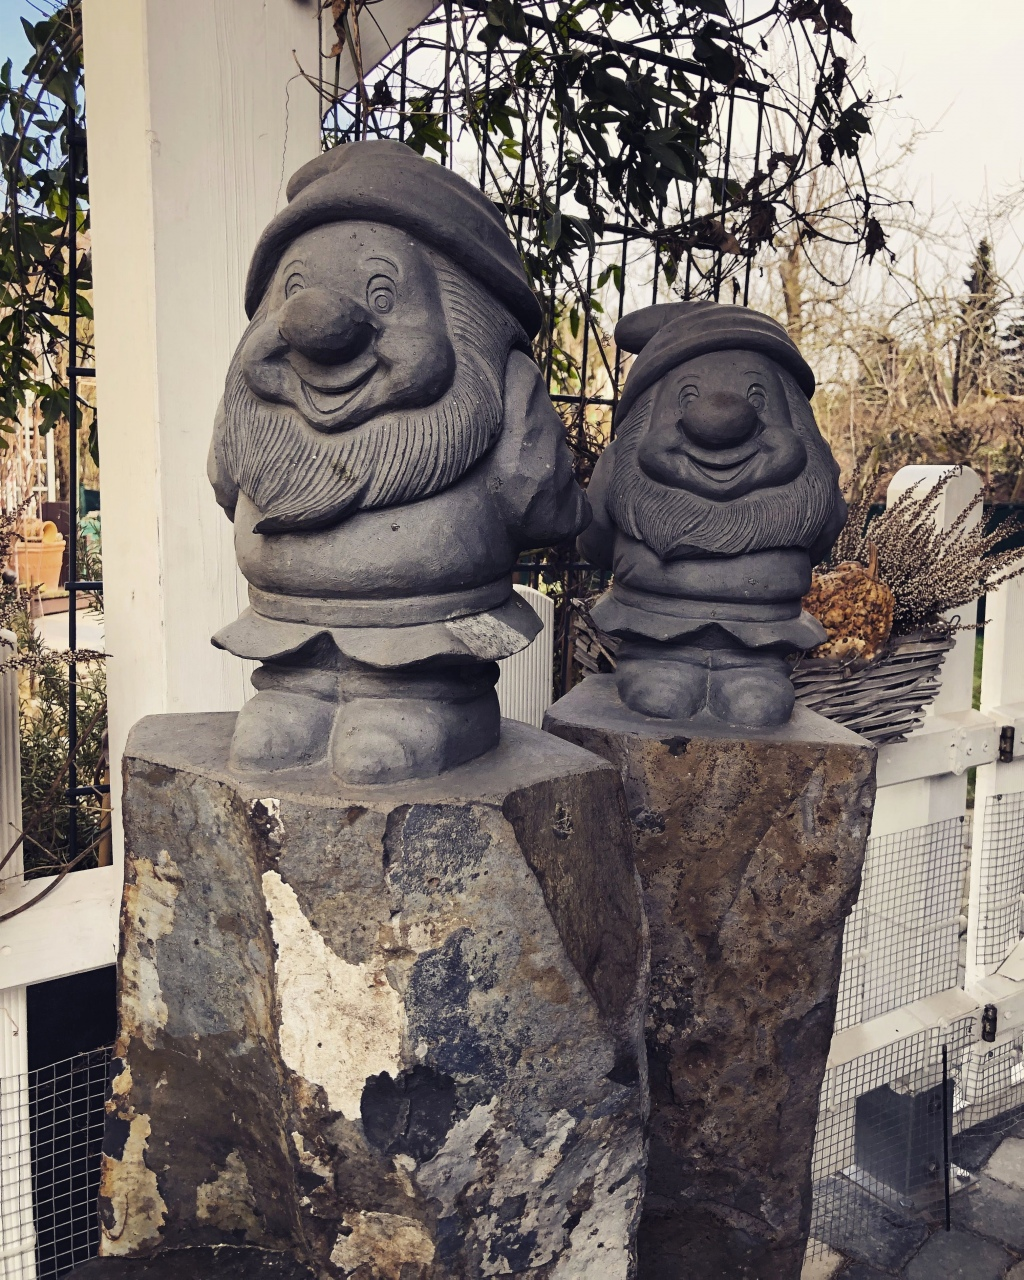 unity sculpture haus u garten elegant yakuzi pool garten luxus media image 0d 34 22 of unity sculpture